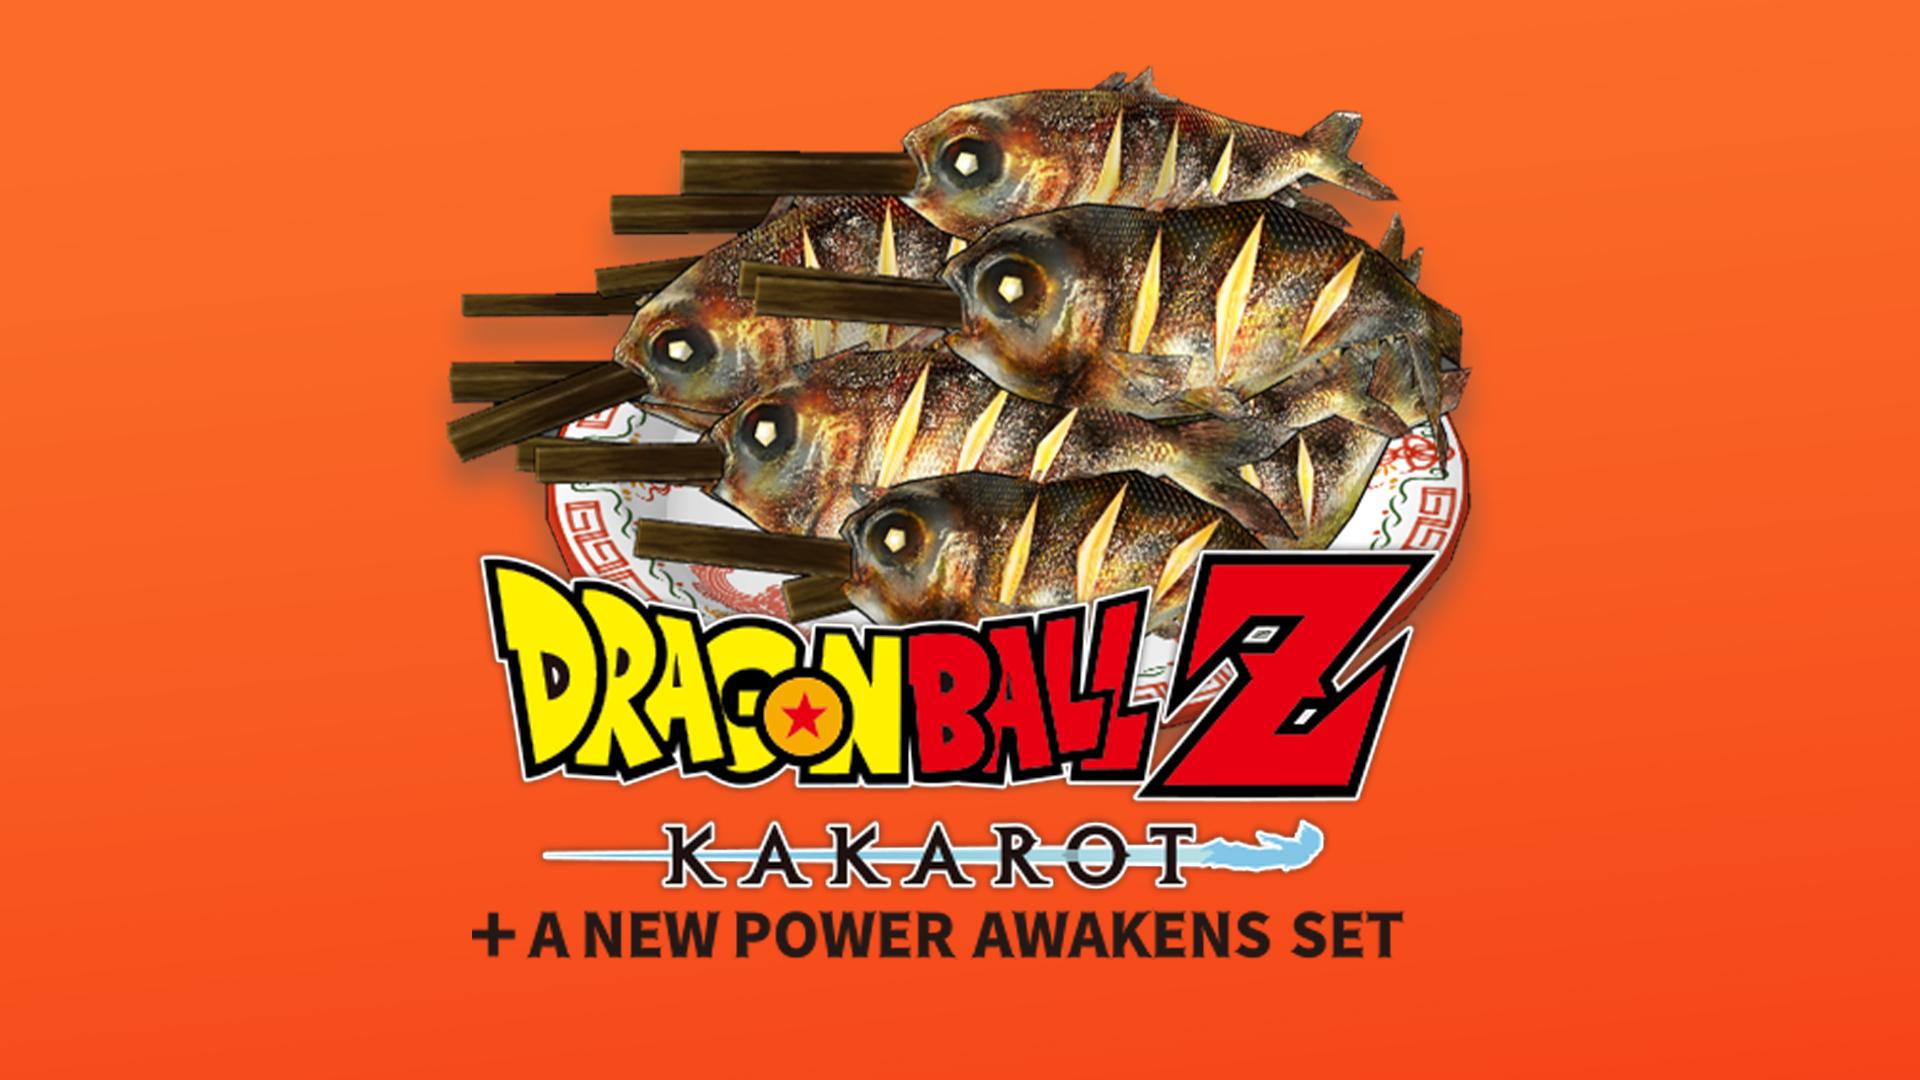 DRAGON BALL Z: KAKAROT + A NEW POWER AWAKENS SET Steaming-Hot Grilled Fish